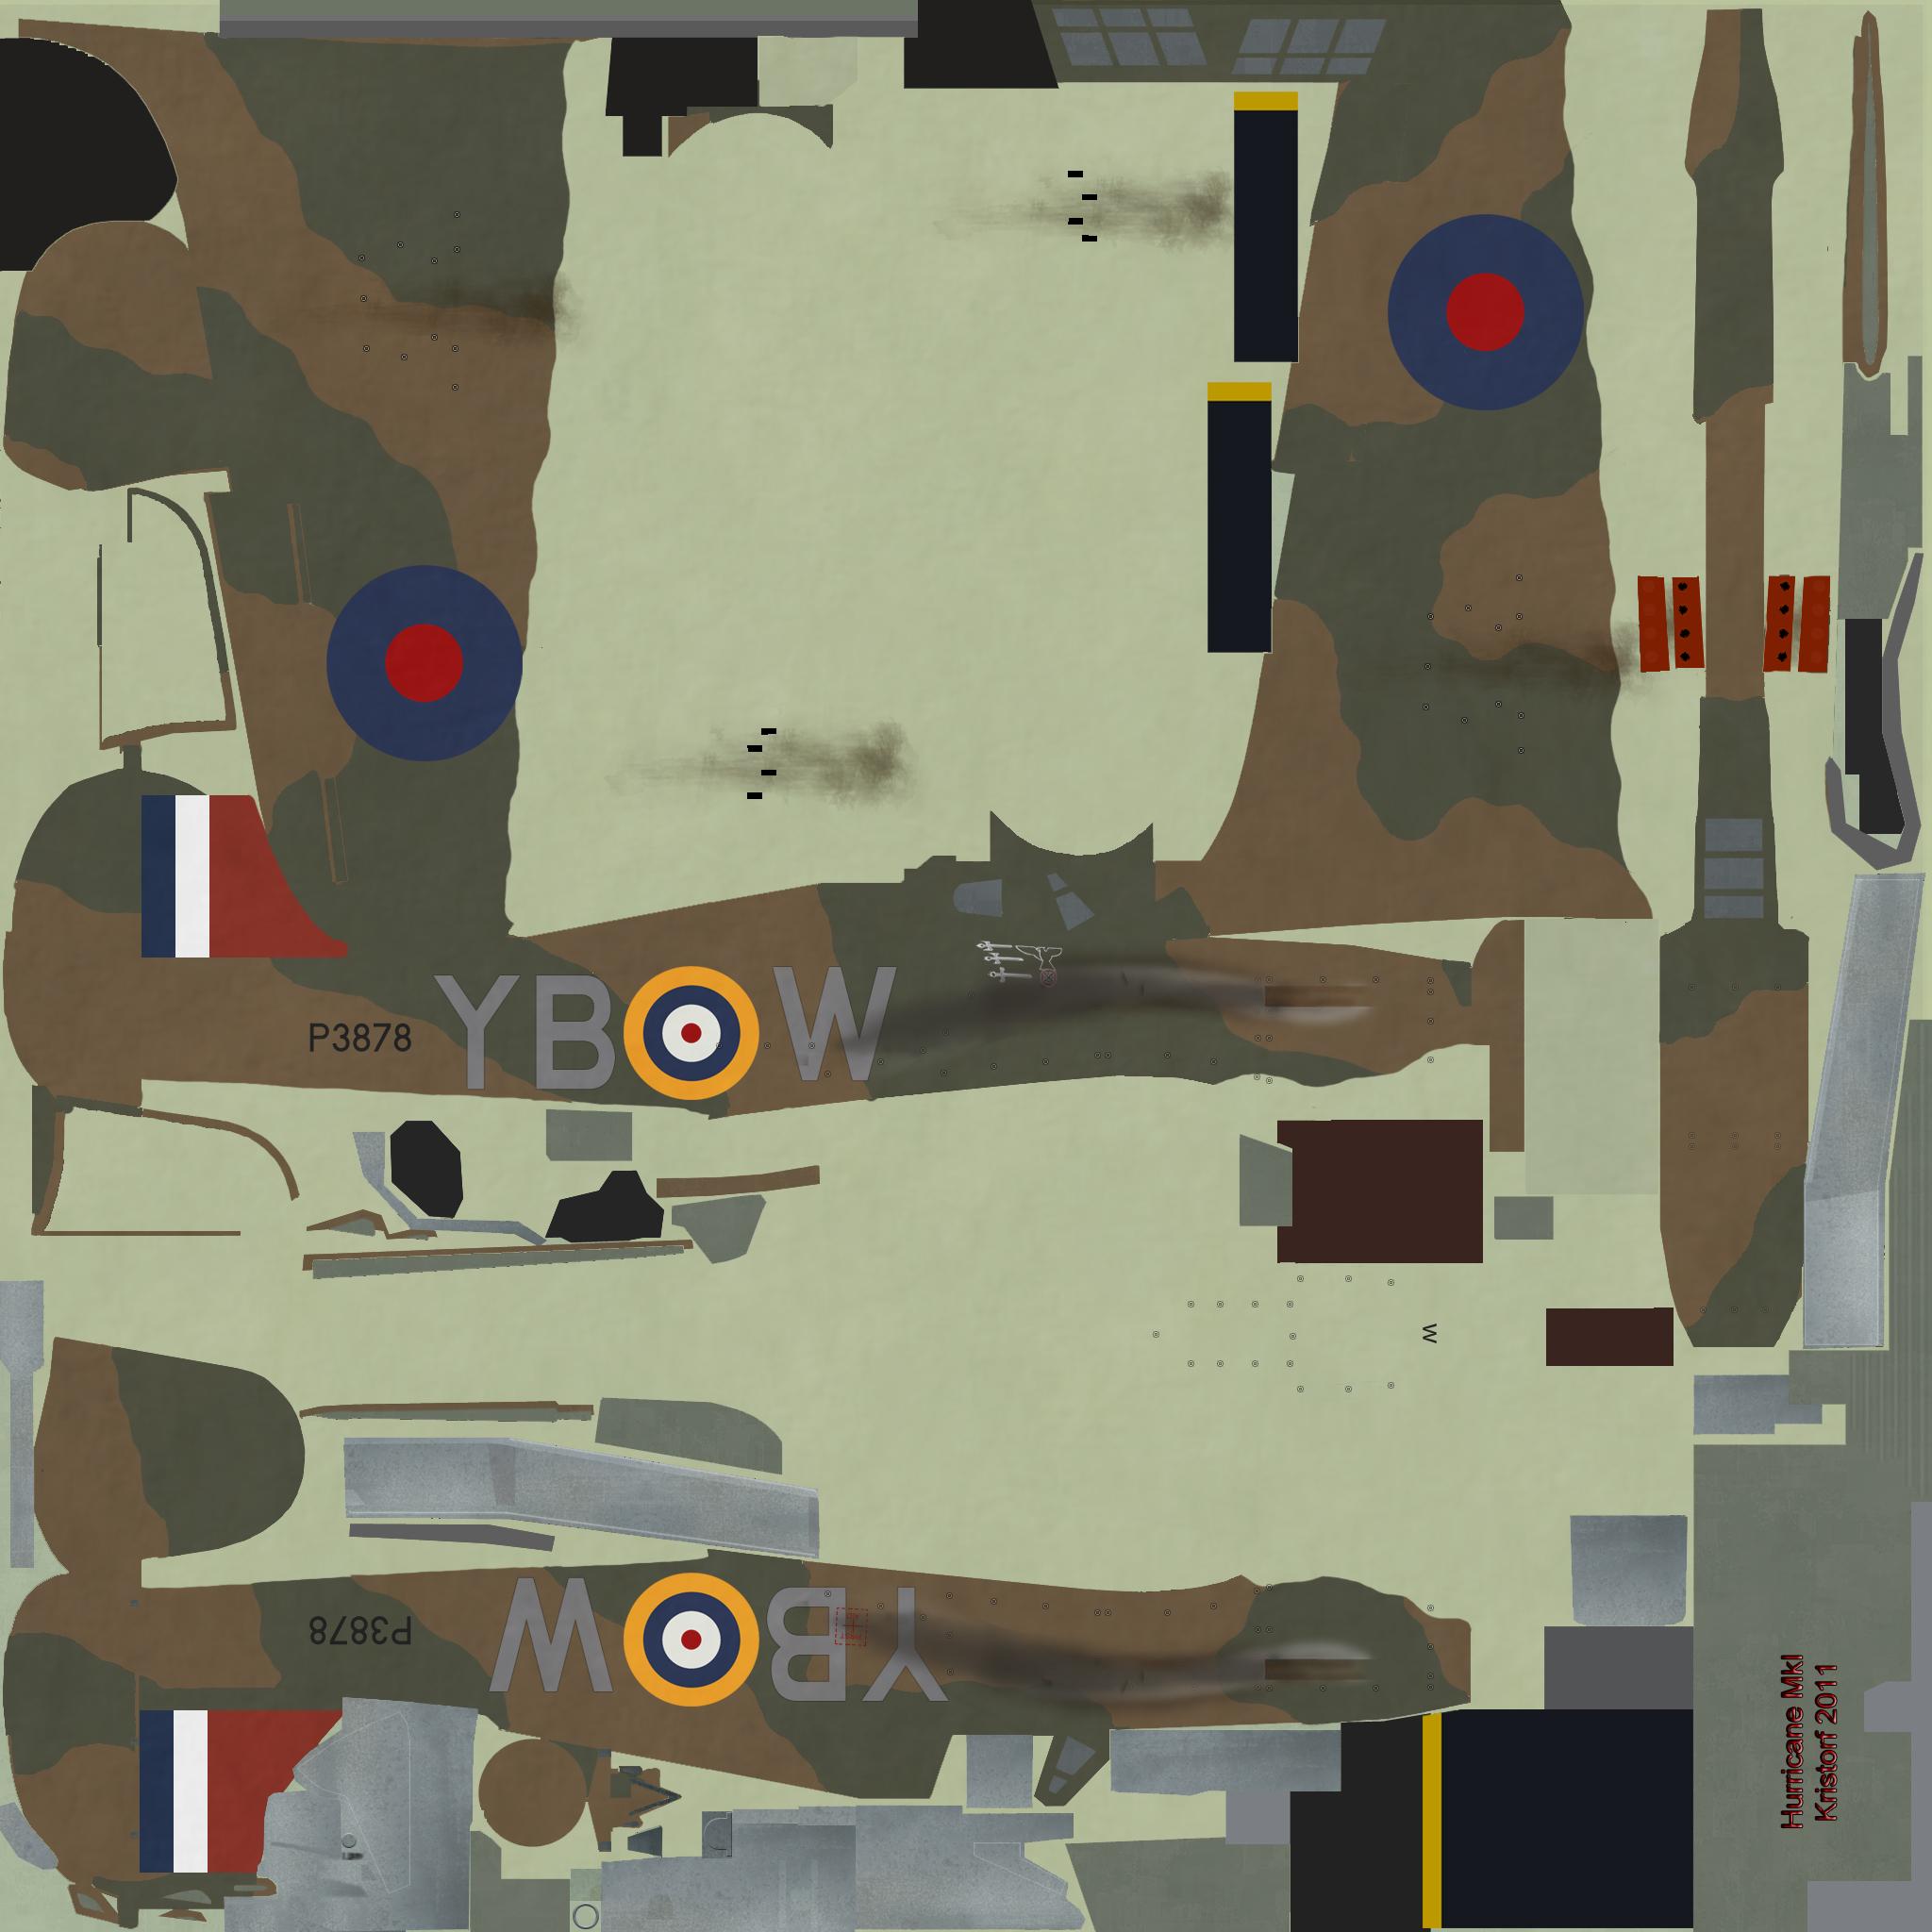 COD KF Hurricane RAF 17Sqn YBW P3878 Bird Wilson Debden England July 1940